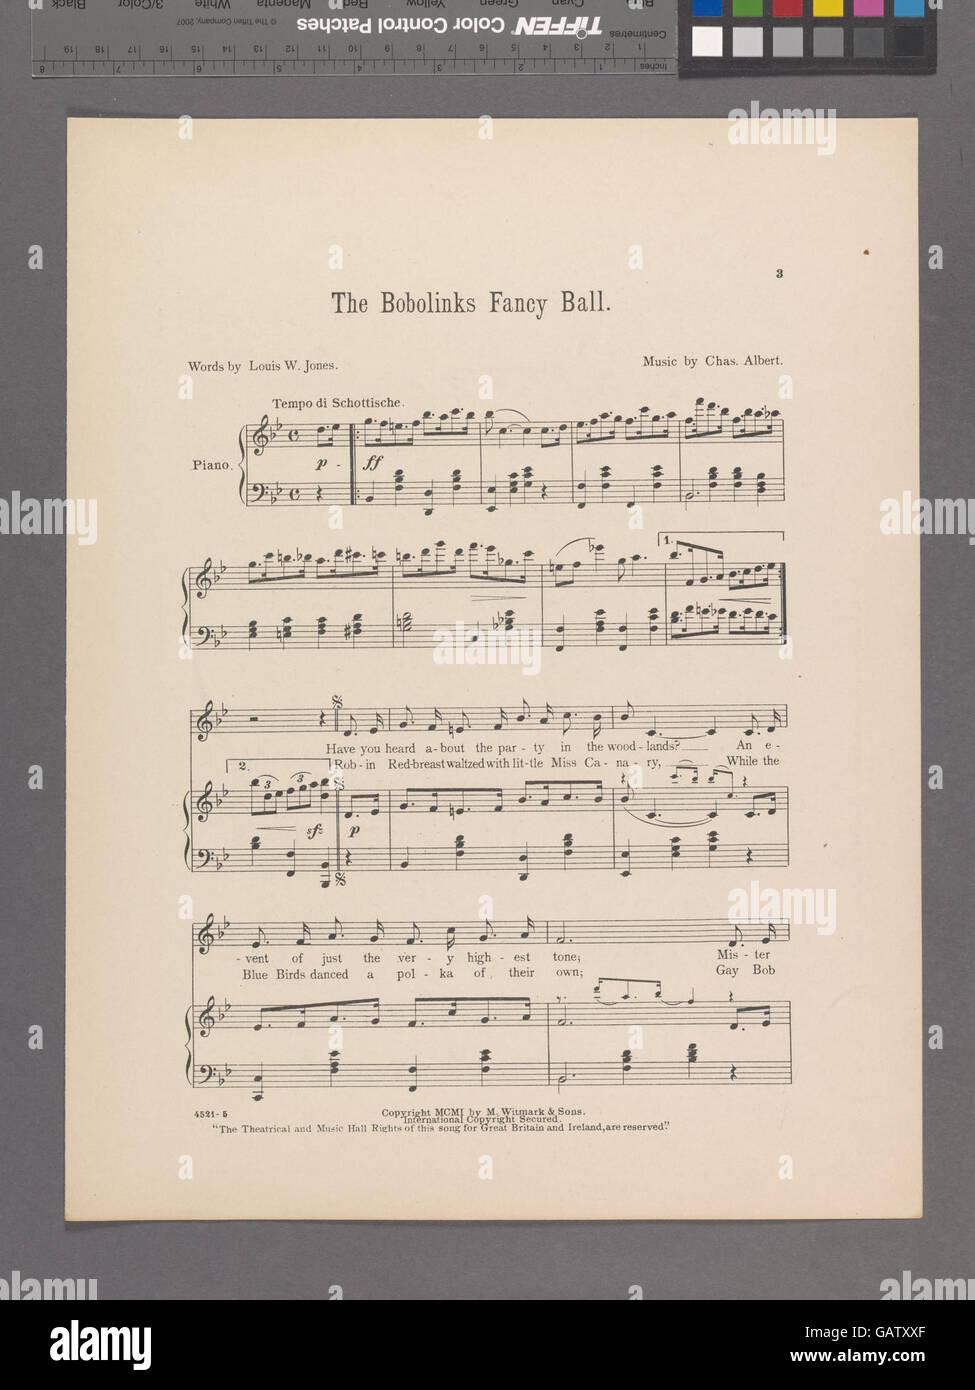 The bobolinks fancy ball ( Hades-1924973-1953240) - Stock Image